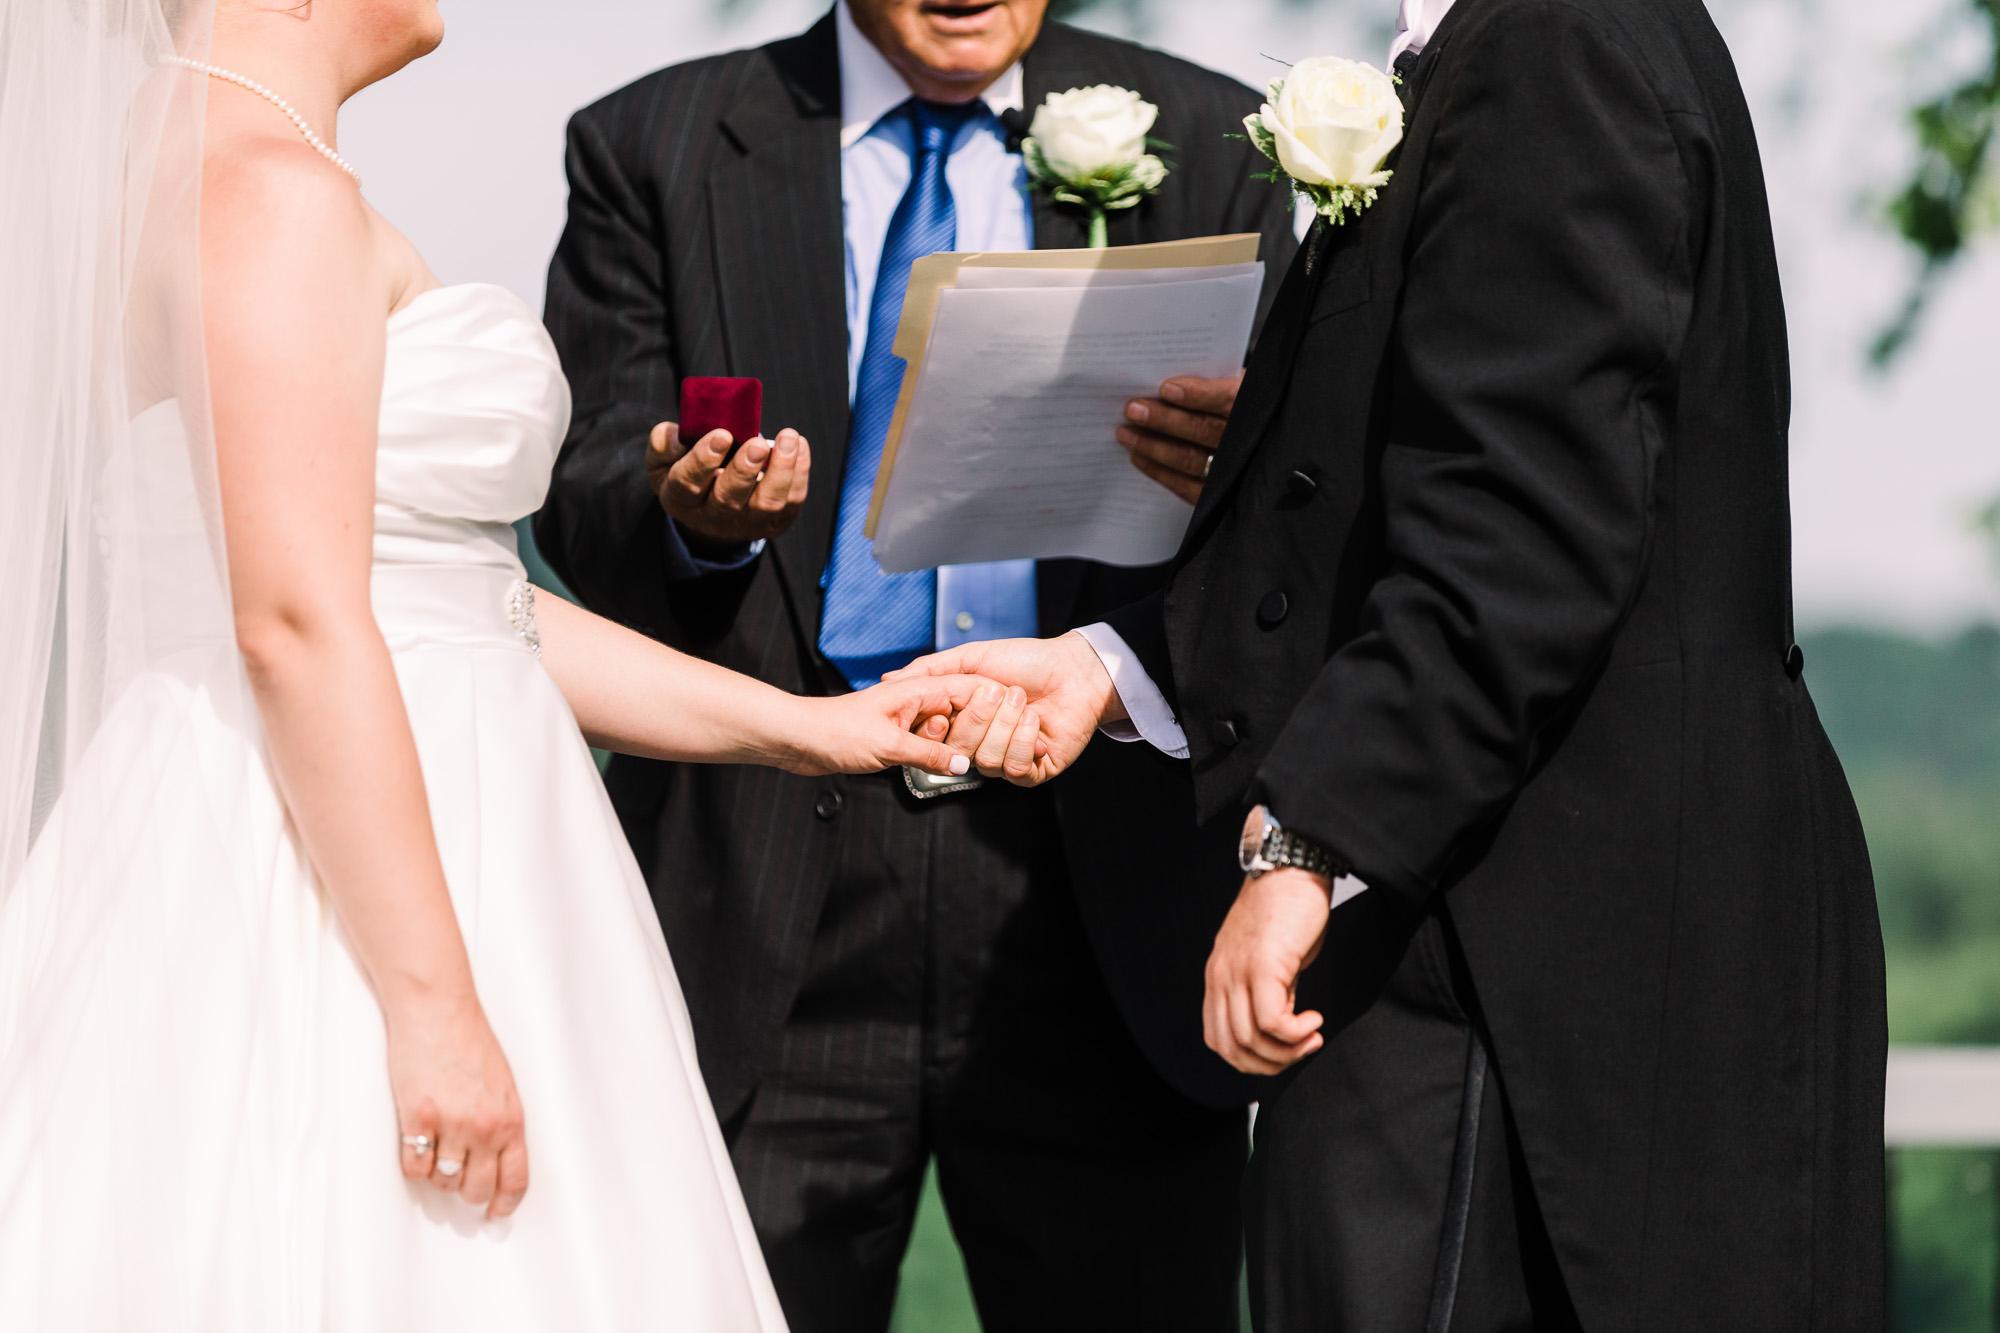 isle-of-que-wedding-3868.jpg